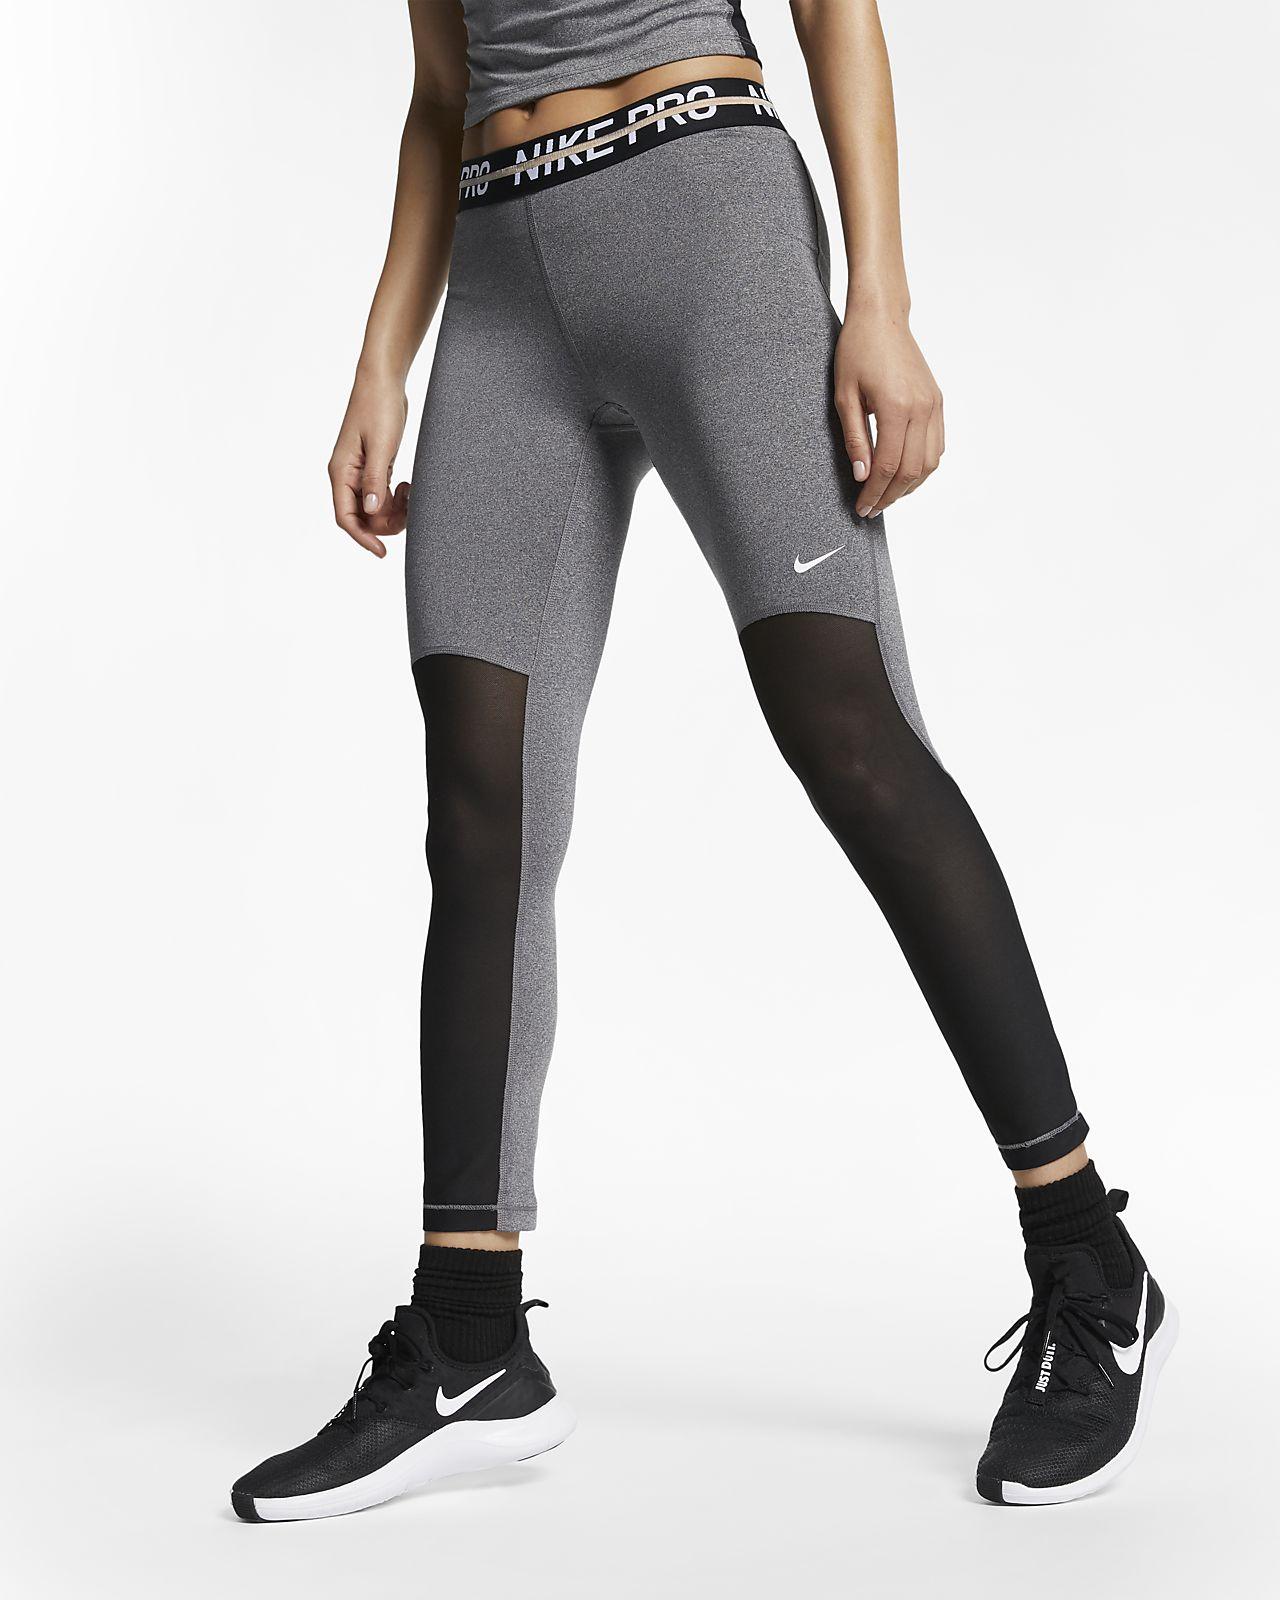 5512a914913b Γυναικείο κολάν 7 8 Nike Pro. Nike.com GR